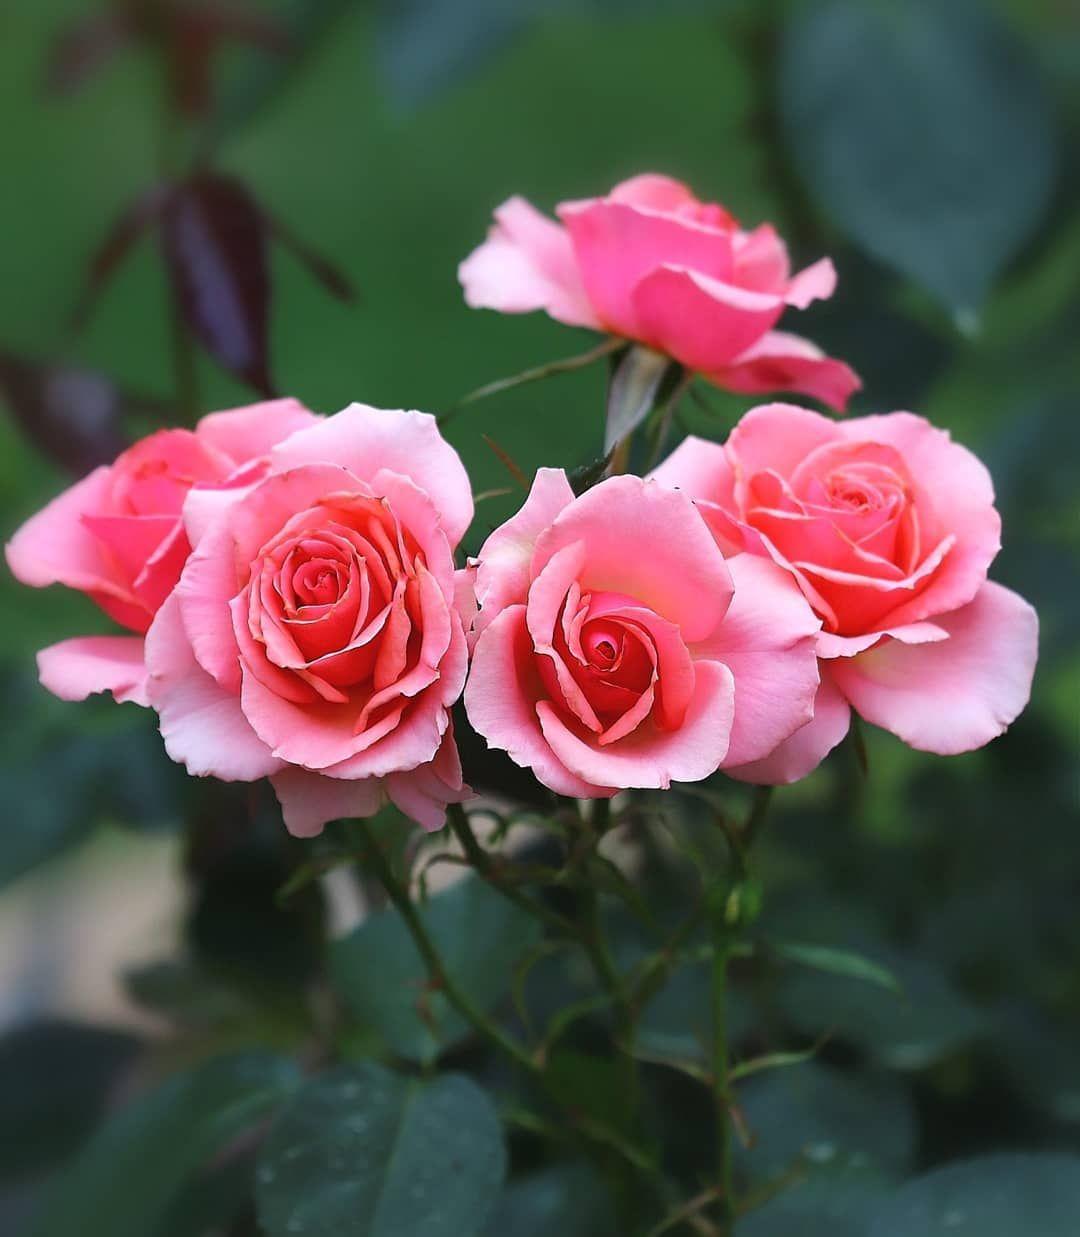 "Polubienia: 97, komentarze: 1 – meiko🦋風花🦋 (@meiko_fuuka) na Instagramie: "". #flowerpassion_world #flowers_collectio  #loves_united_flora #flower_igers #mta_flowers…"""